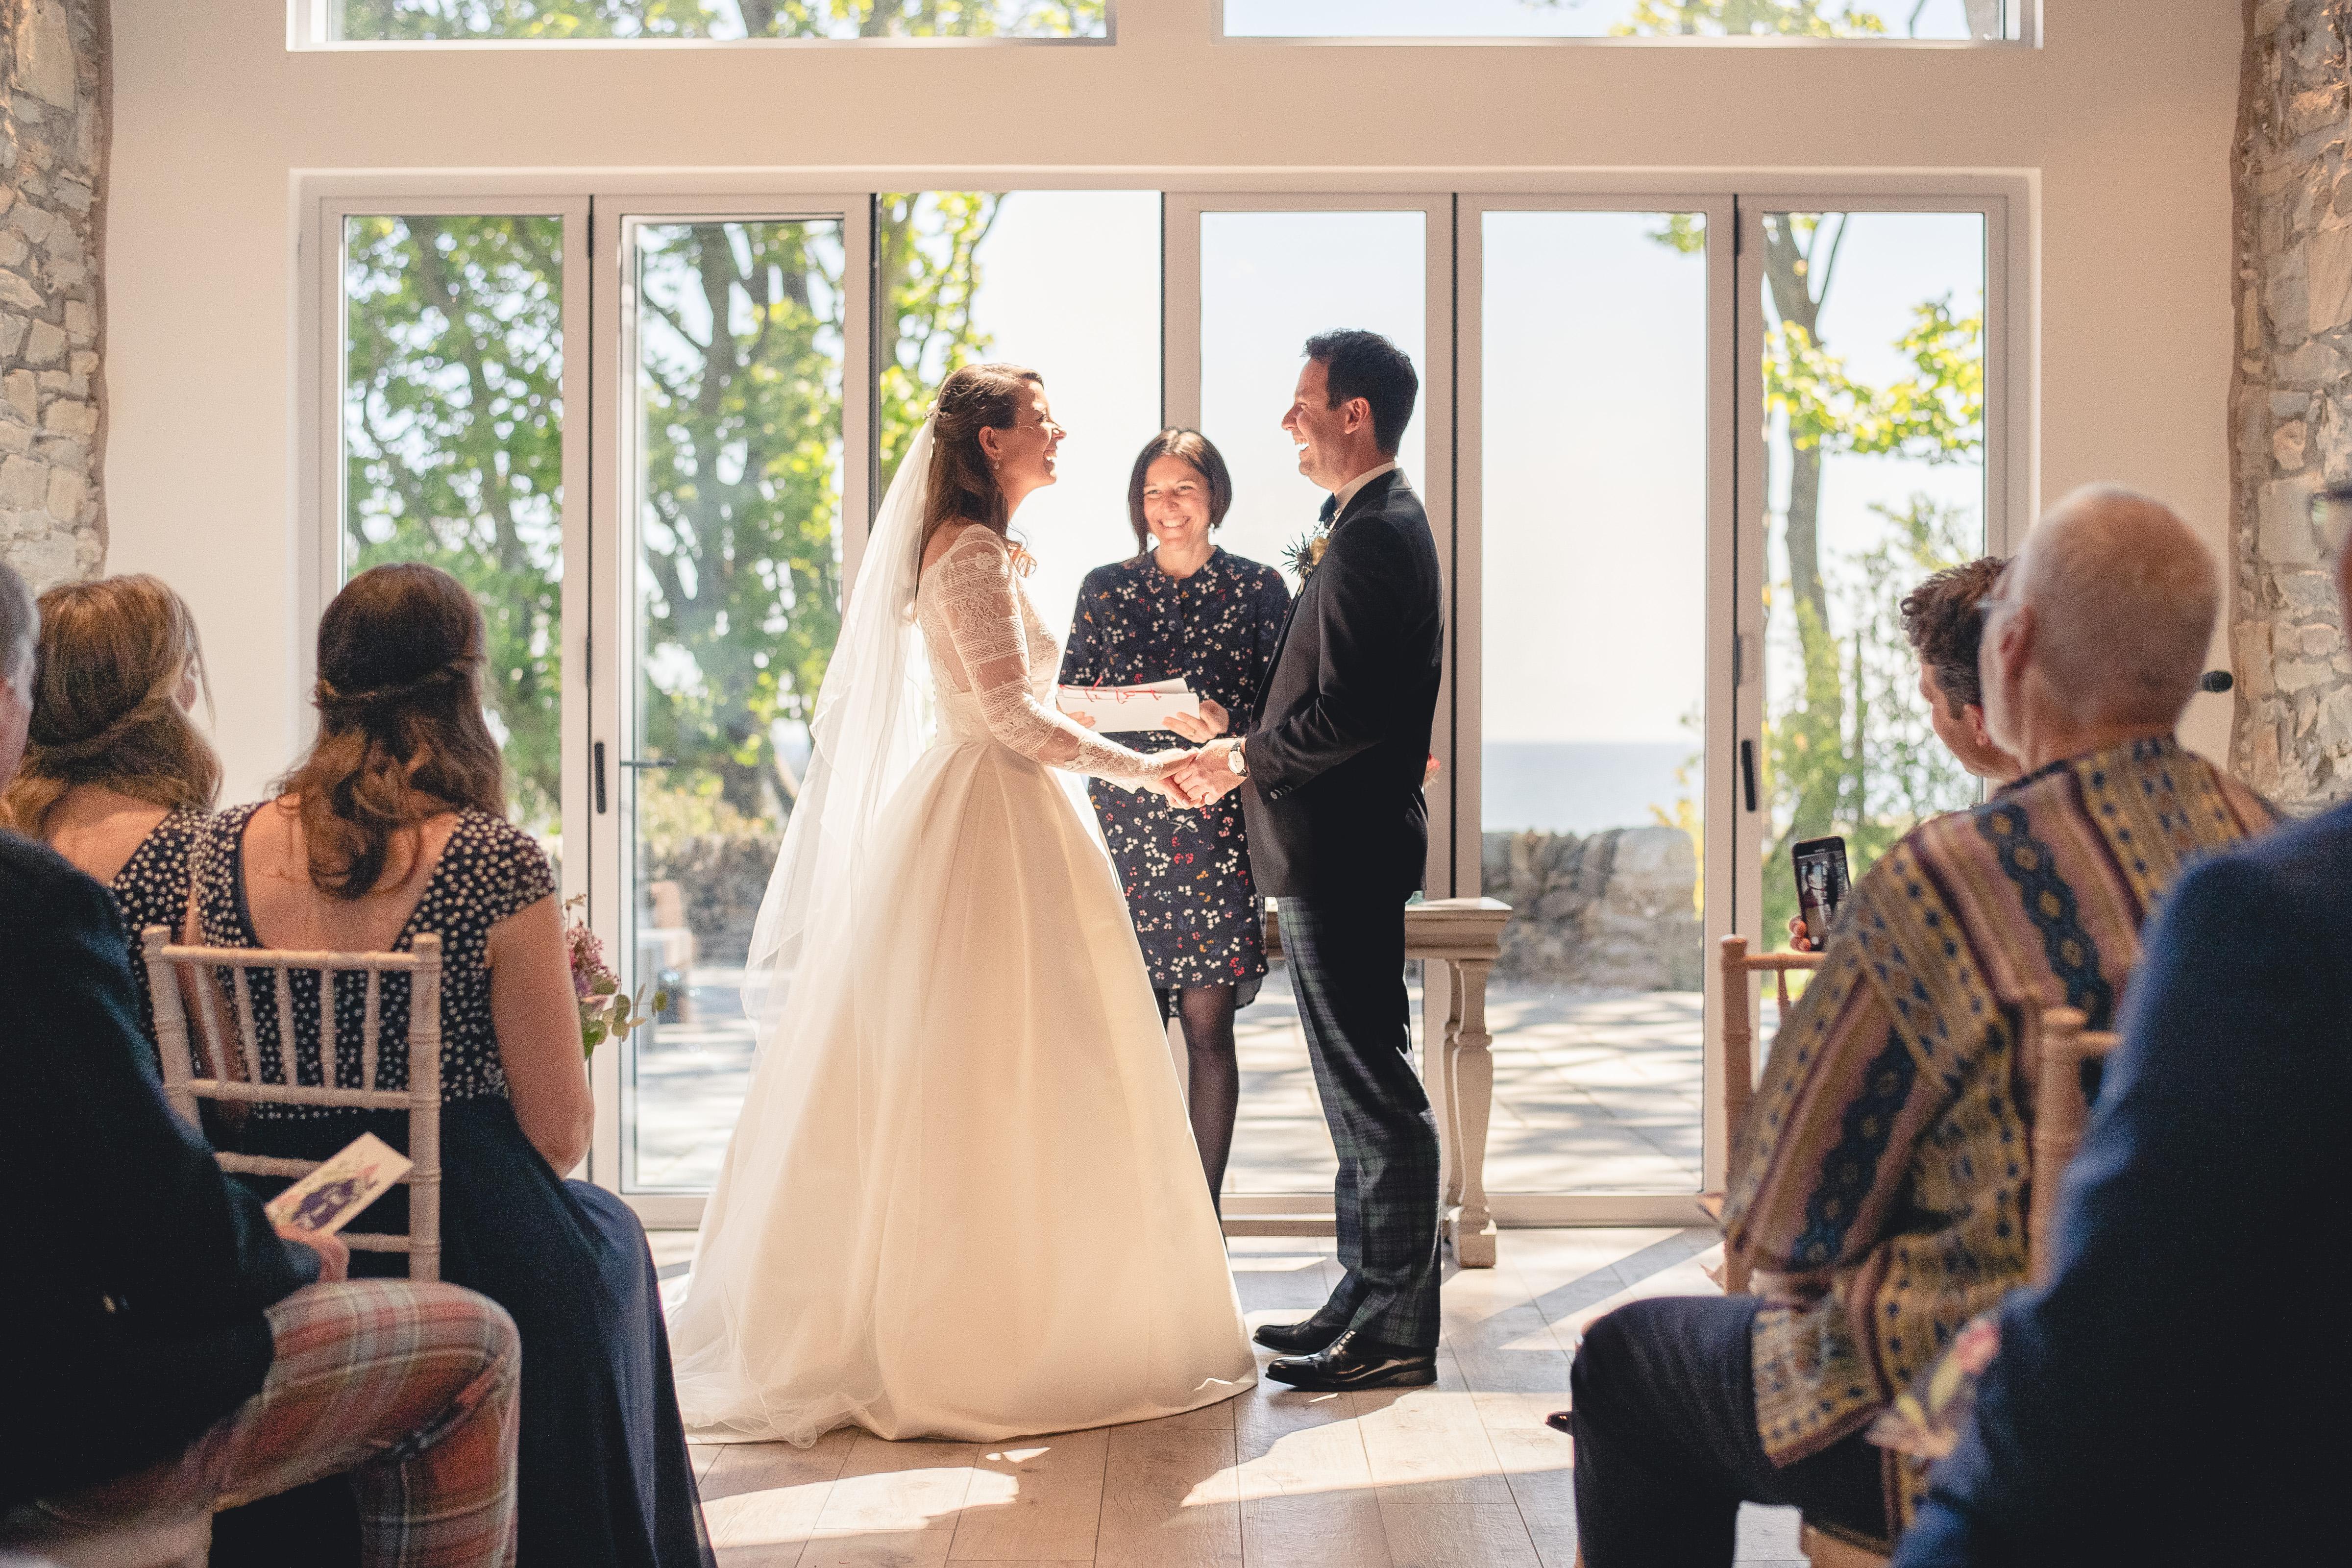 Handfasting Ceremony in Scotland conducted by Wedding Celebrant, Onie Tibbitt.